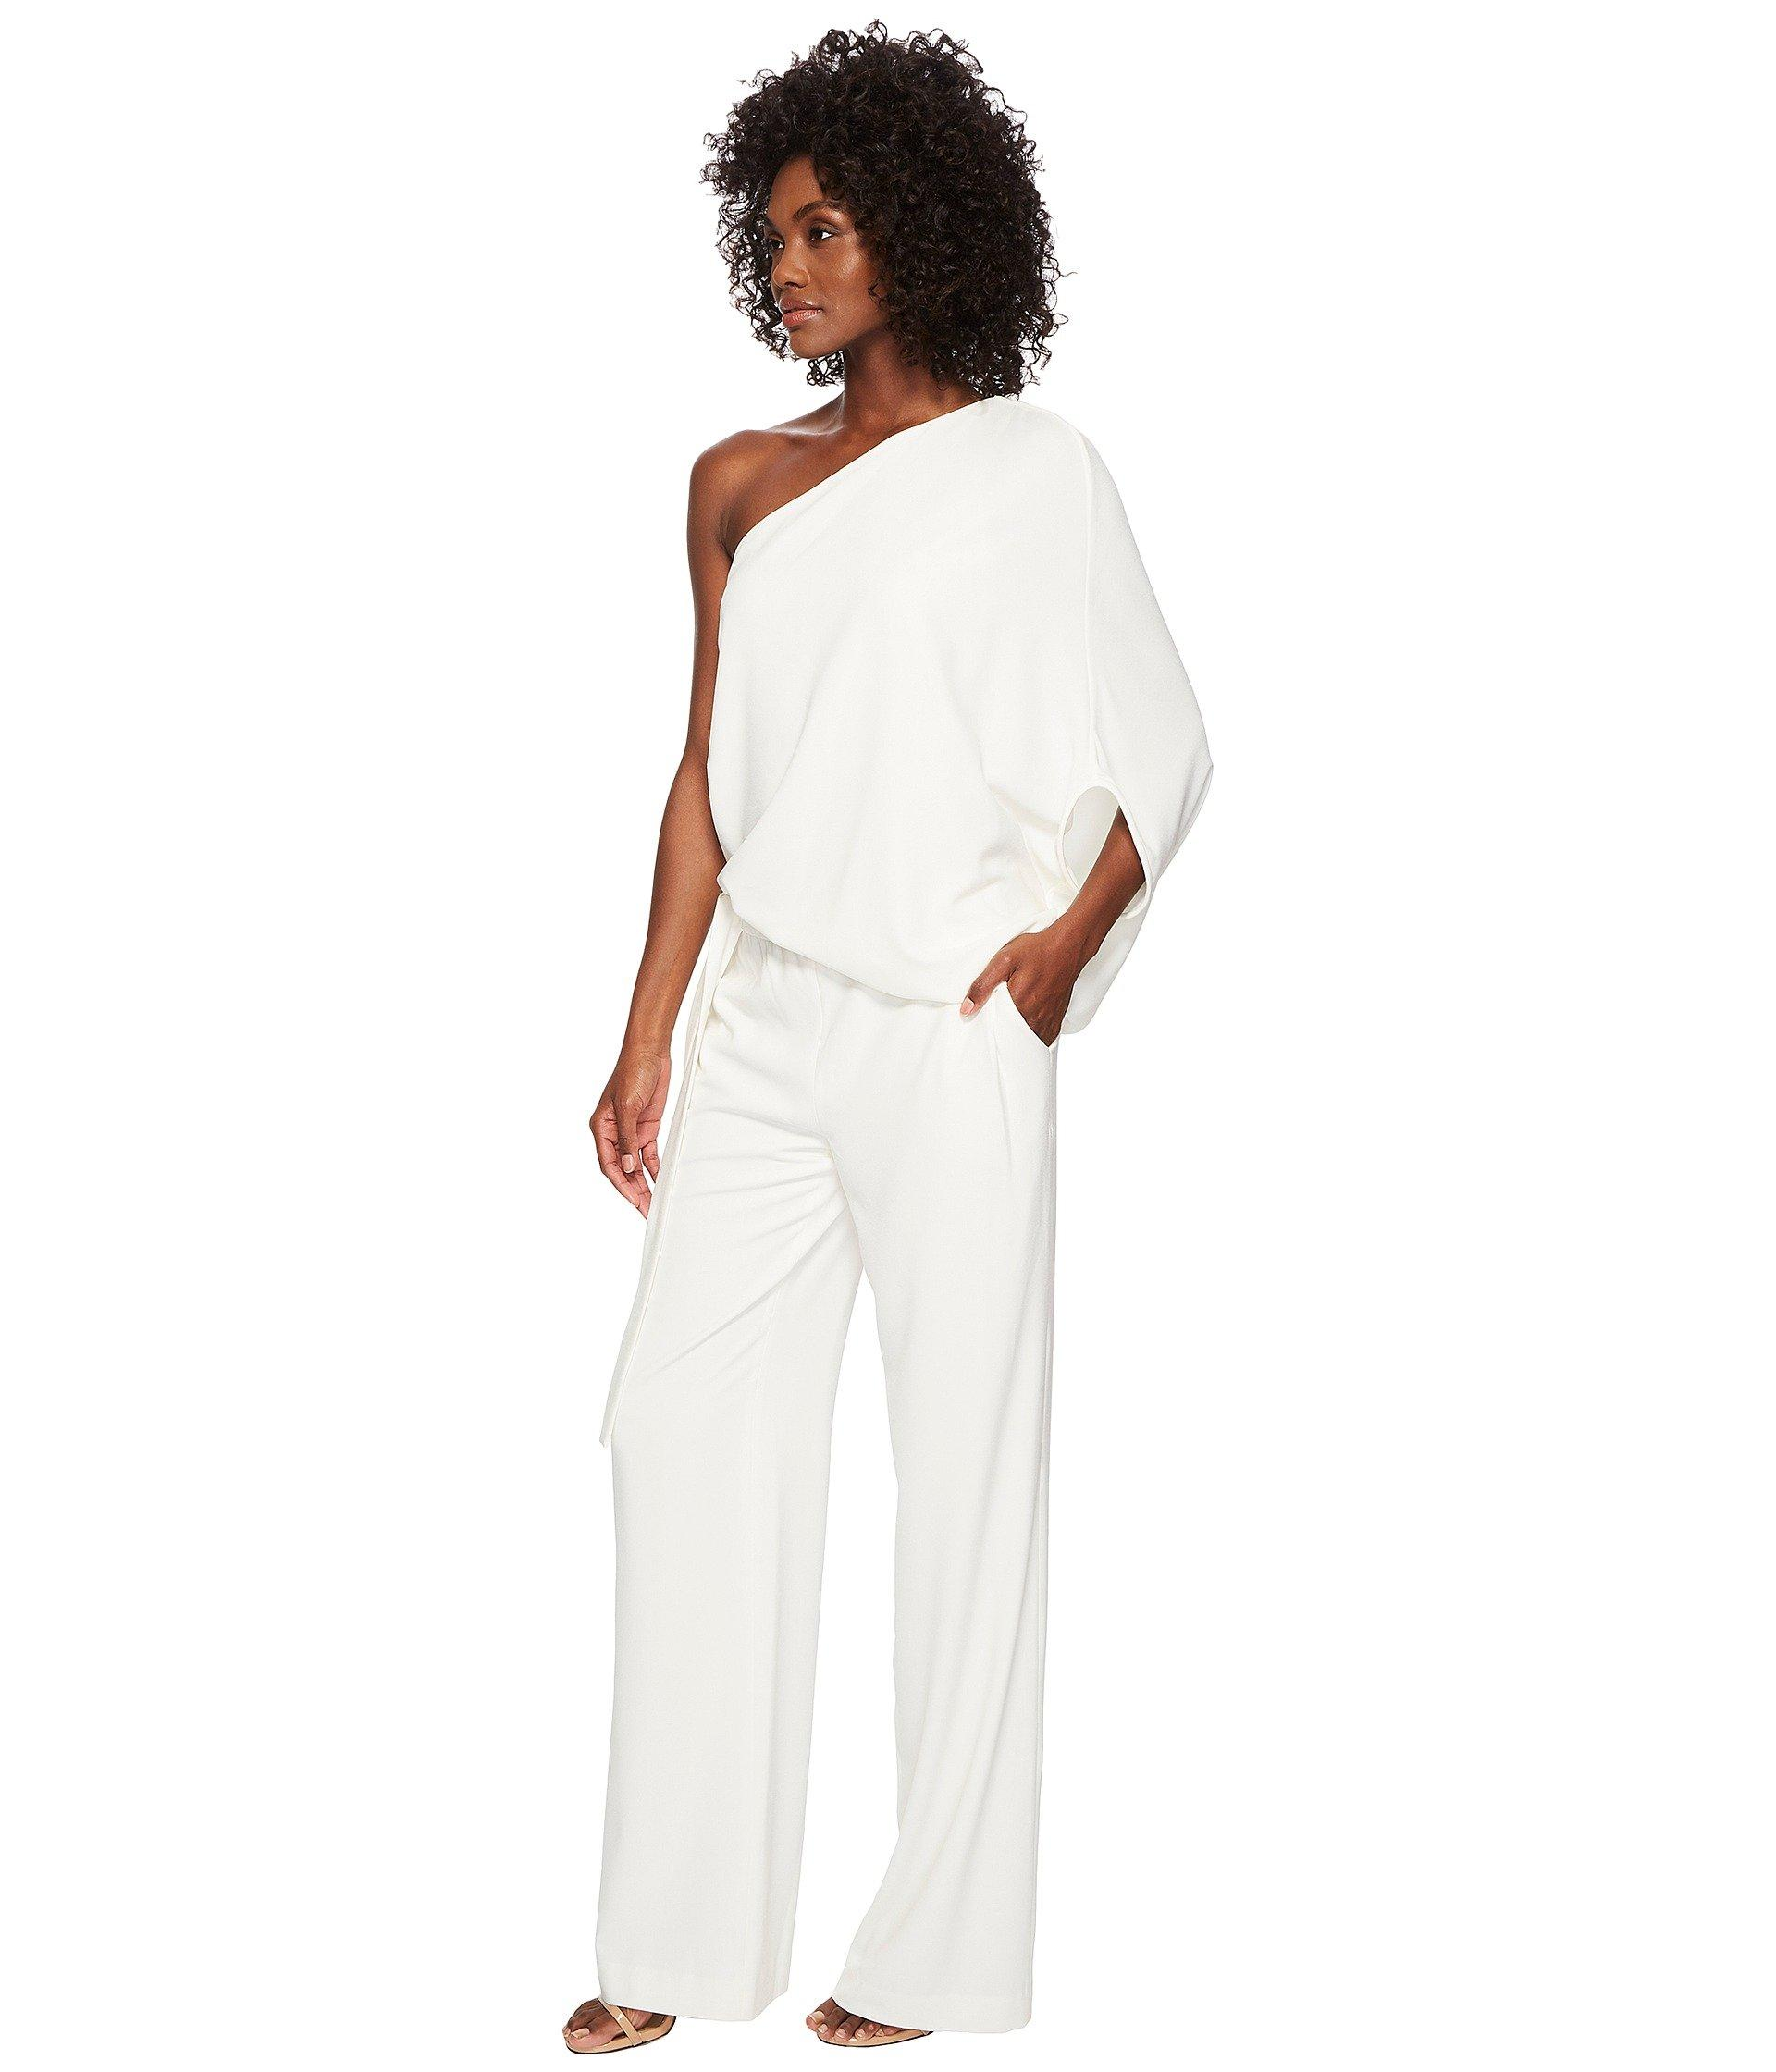 7d25b7dc17e1 Lyst - Halston Asymmetrical Crepe Jumpsuit (navy) Women s Jumpsuit   Rompers  One Piece in White